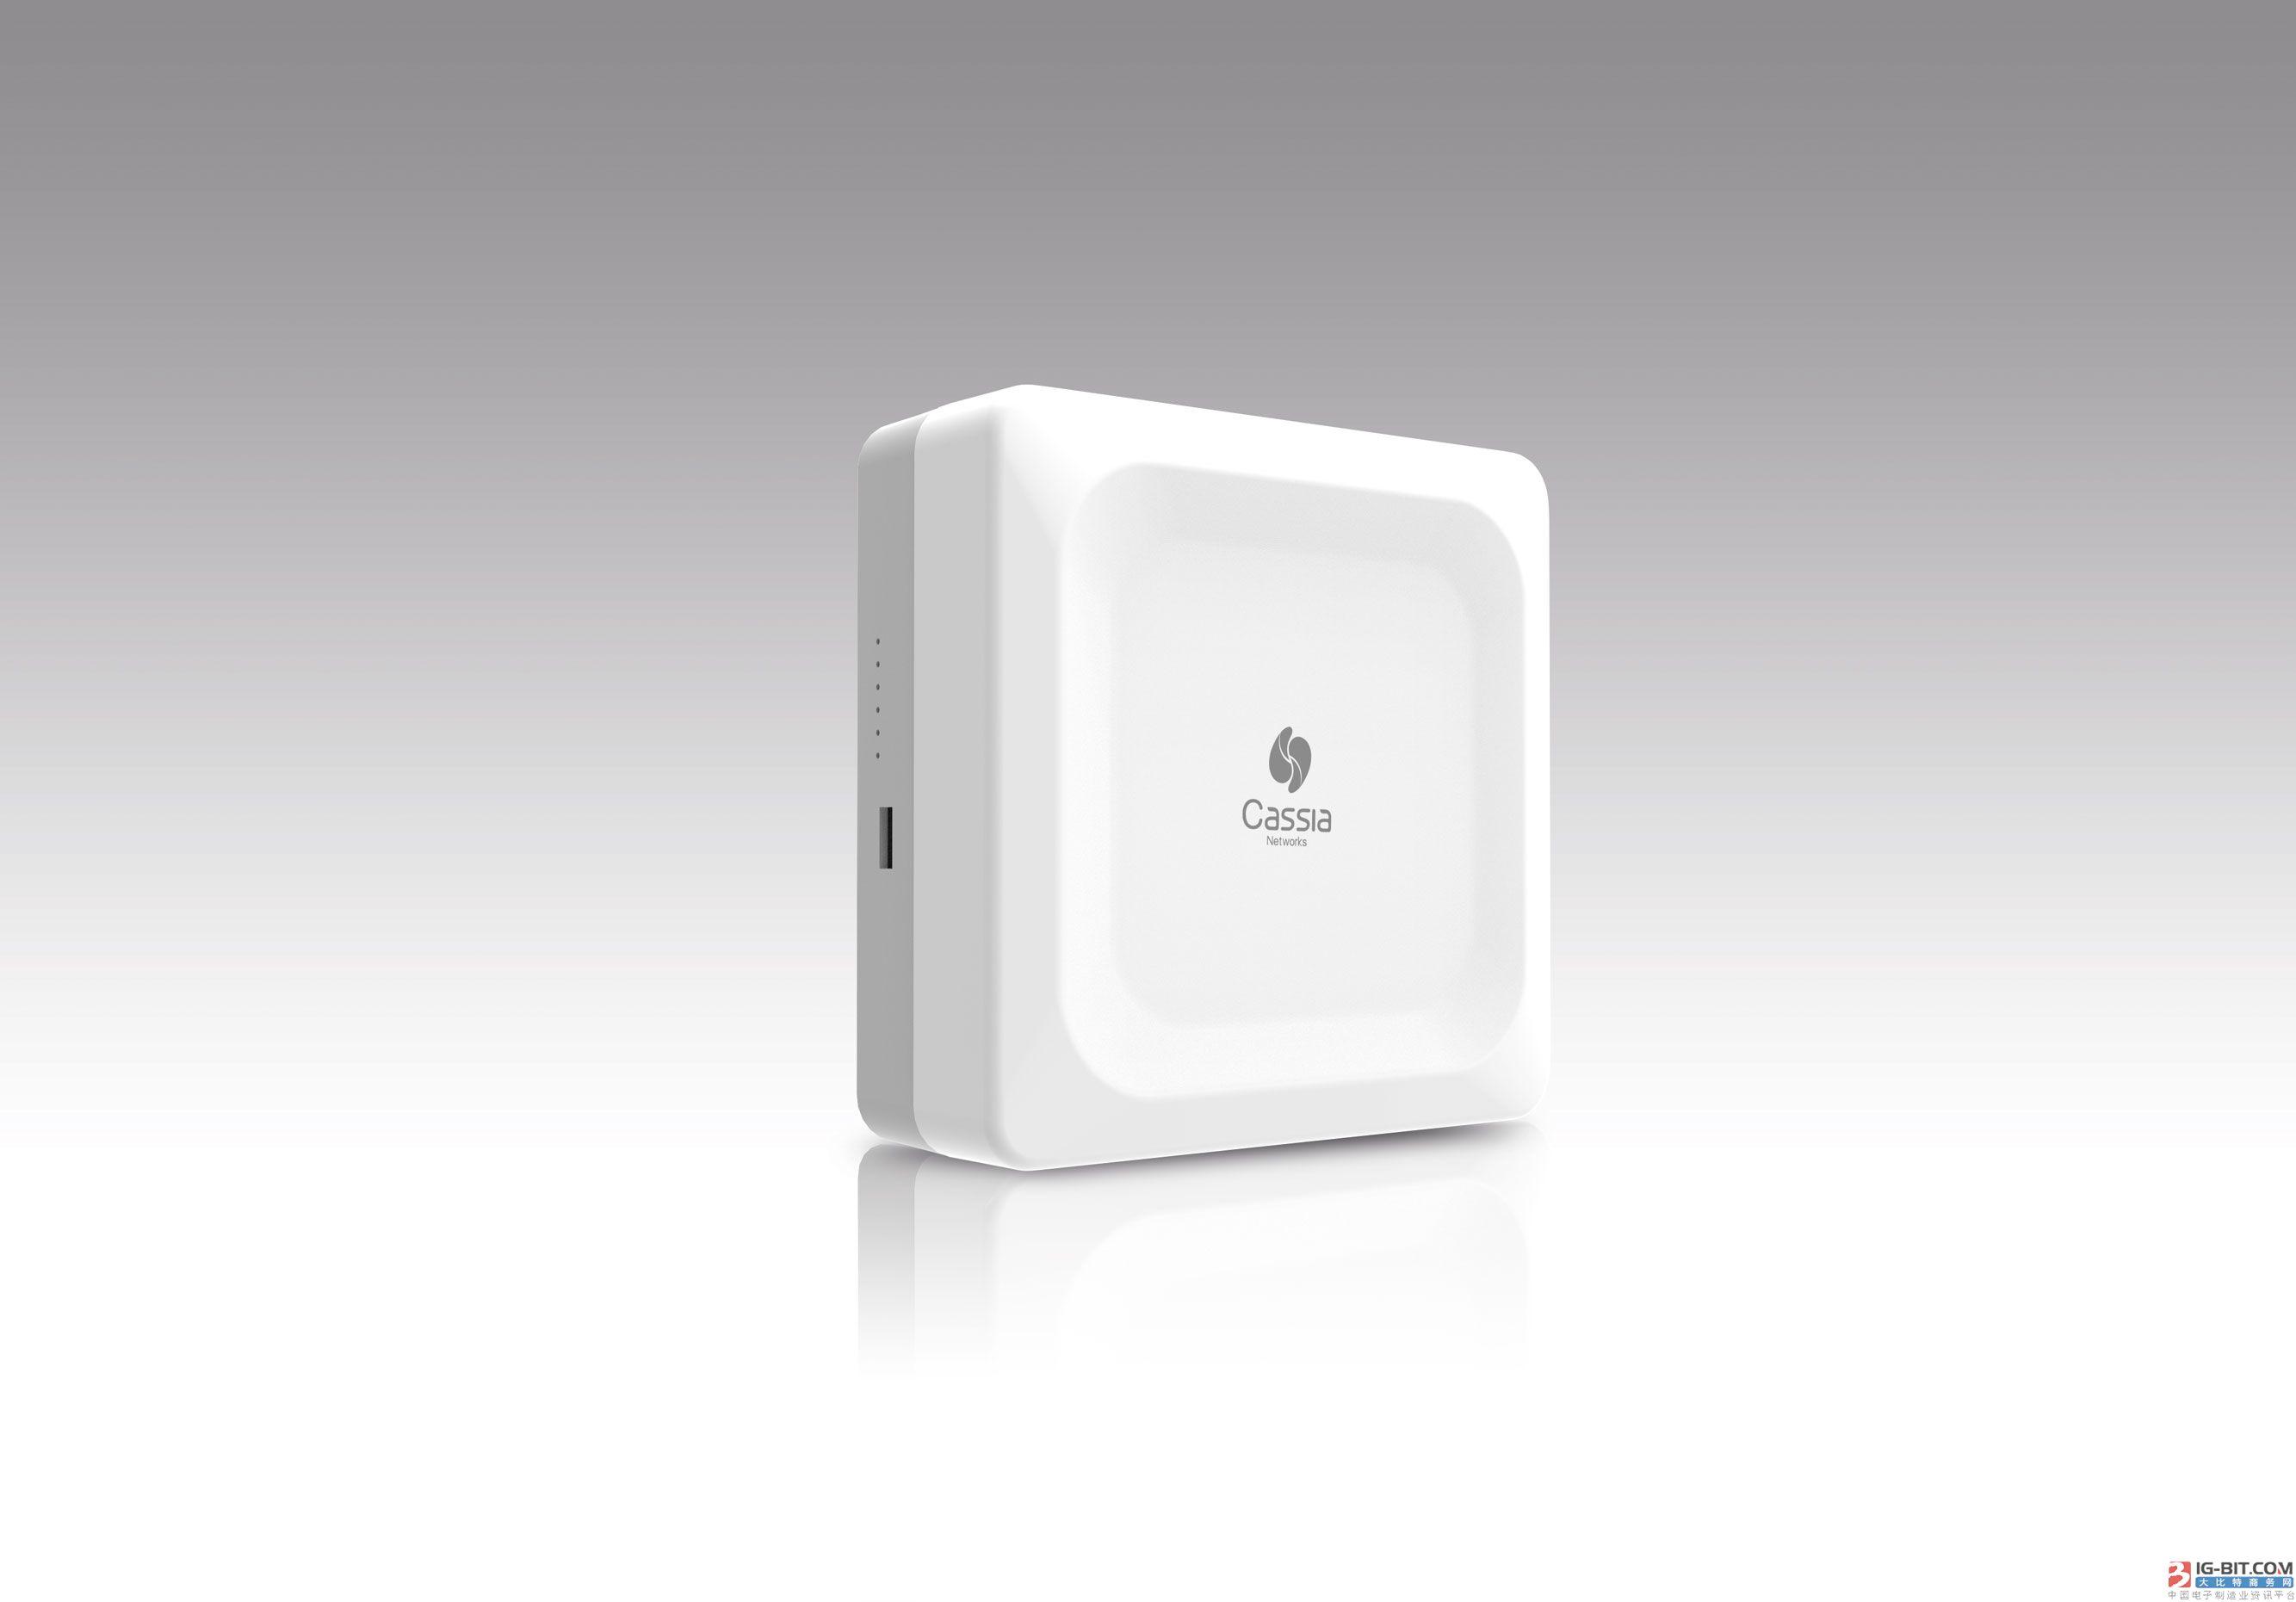 Nordic助力长距离低功耗蓝牙路由器实现用于企业IoT应用的实时边缘处理和多个配对连接